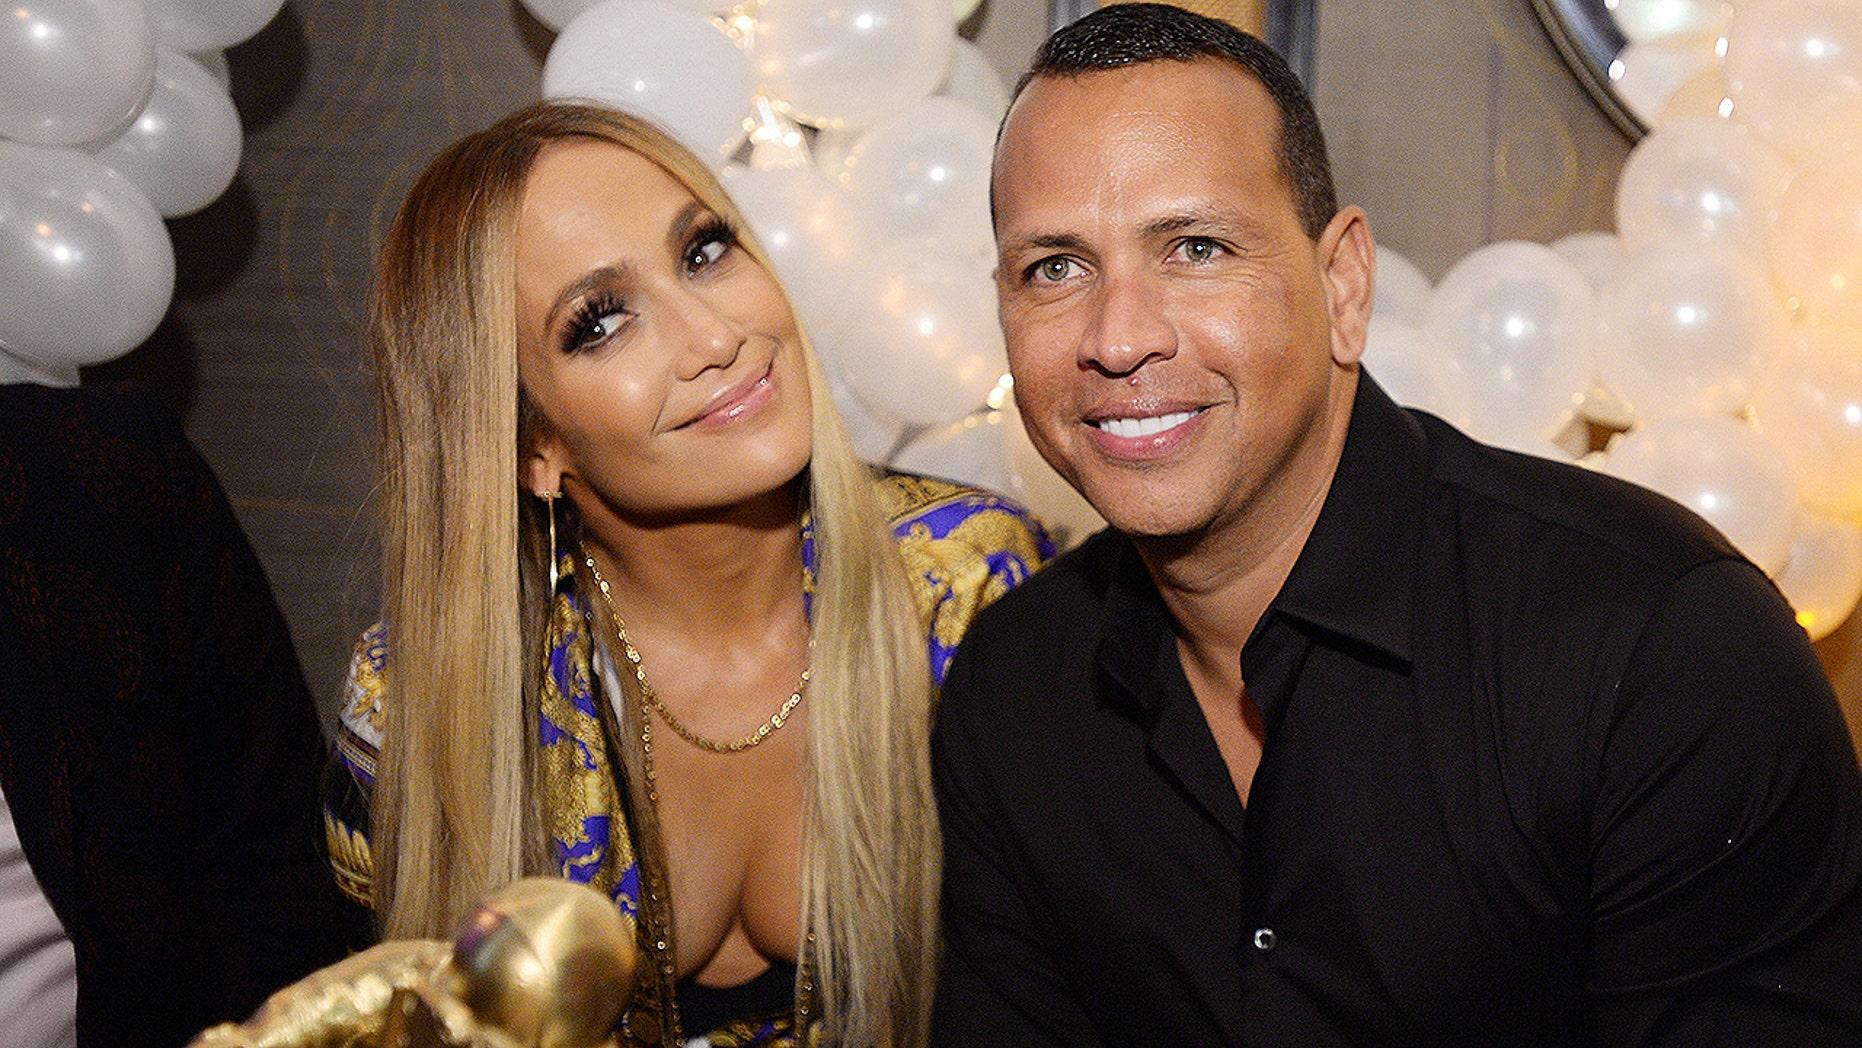 Alex Rodriguez Gushes Over 'Beautiful' Fiancee Jennifer Lopez